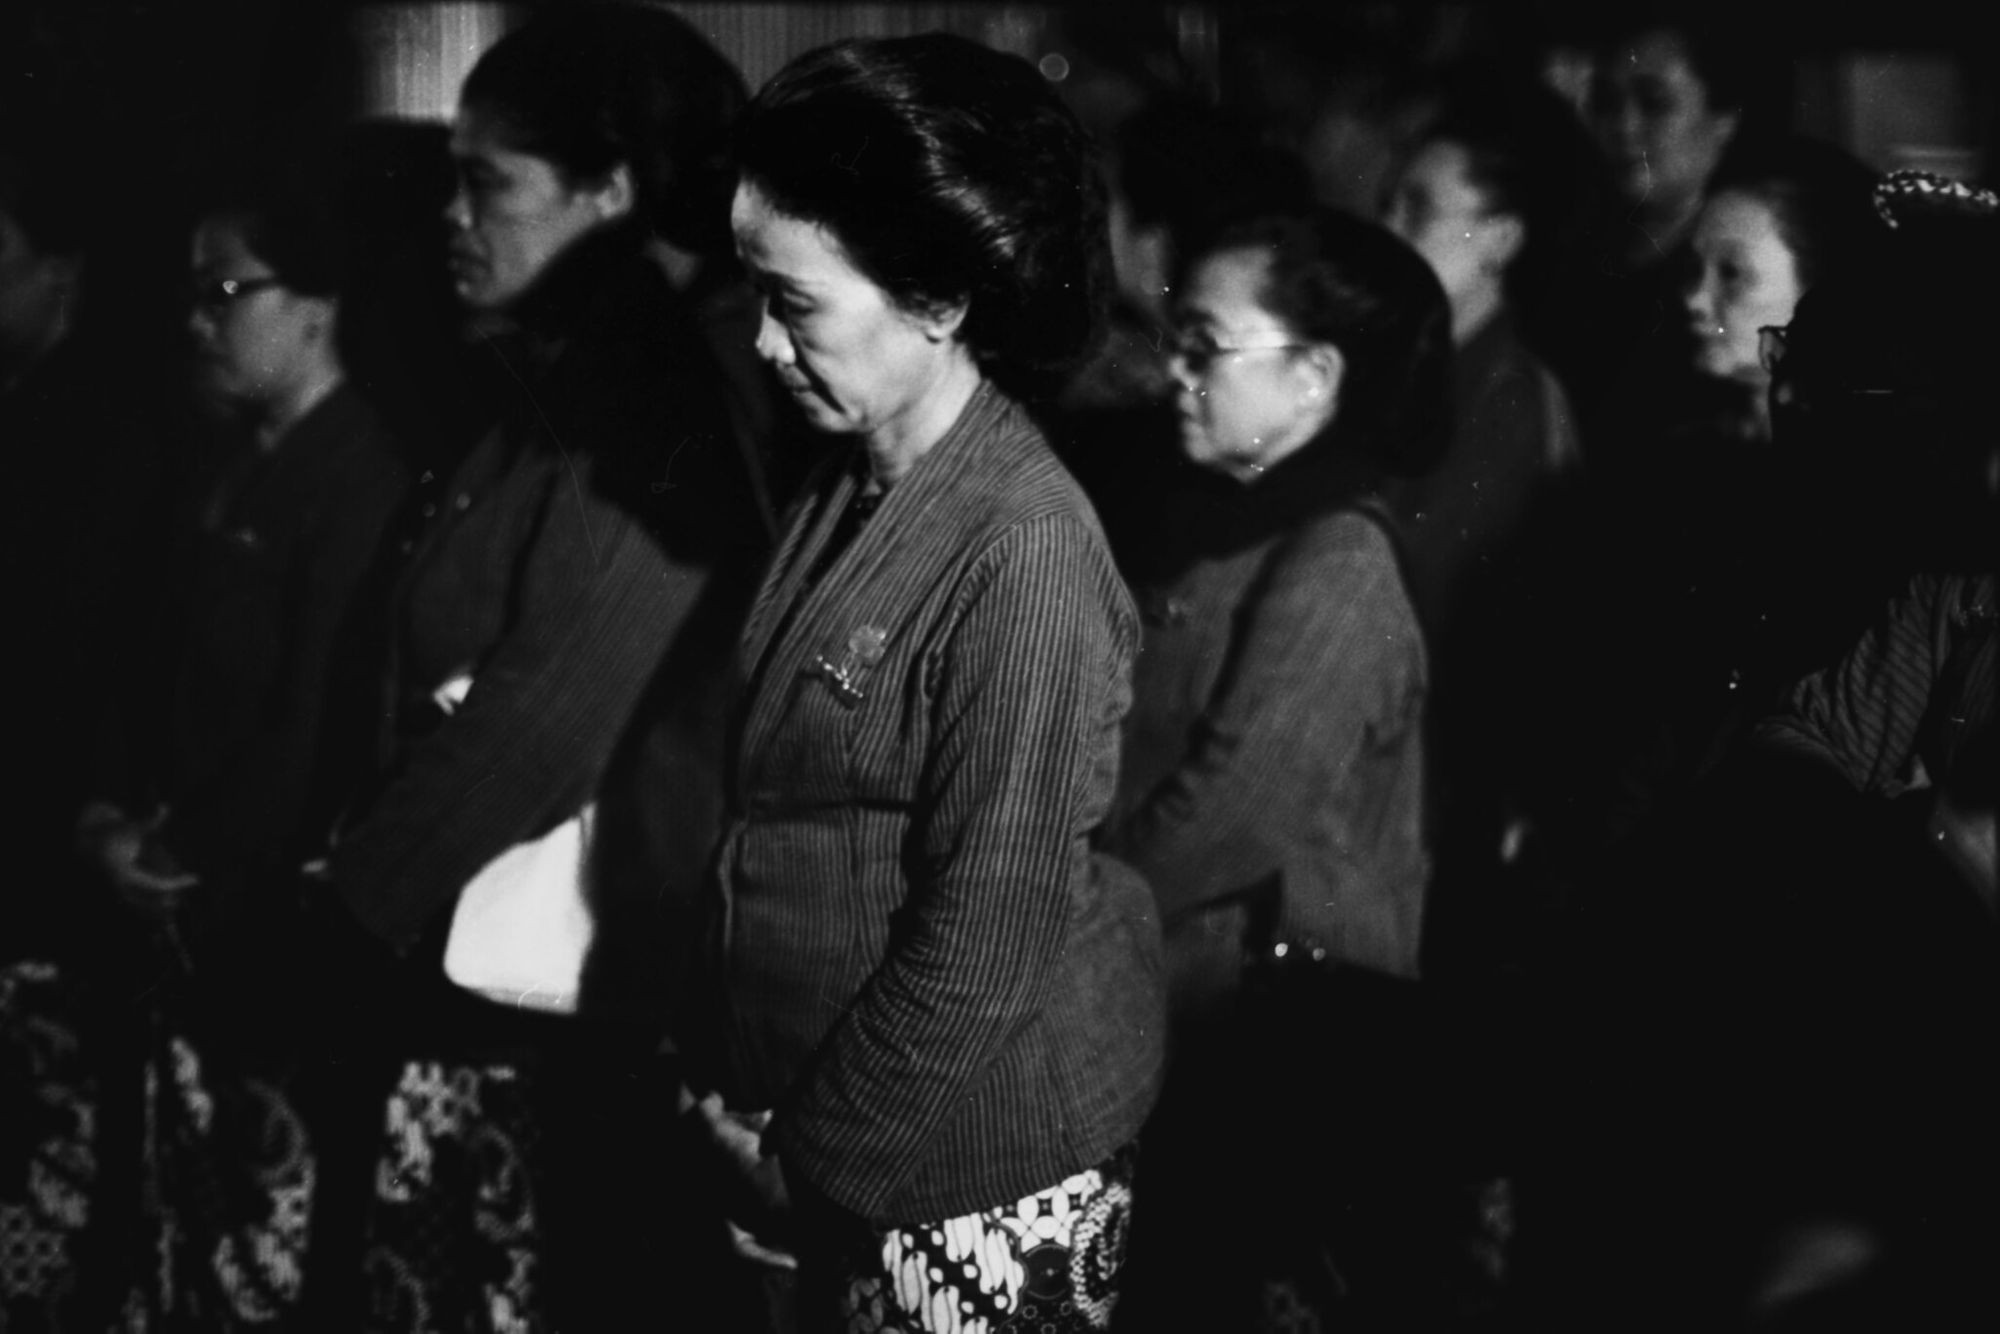 Mengenal Kejawen dan Organisasi Kebatinan Subud di Jawa